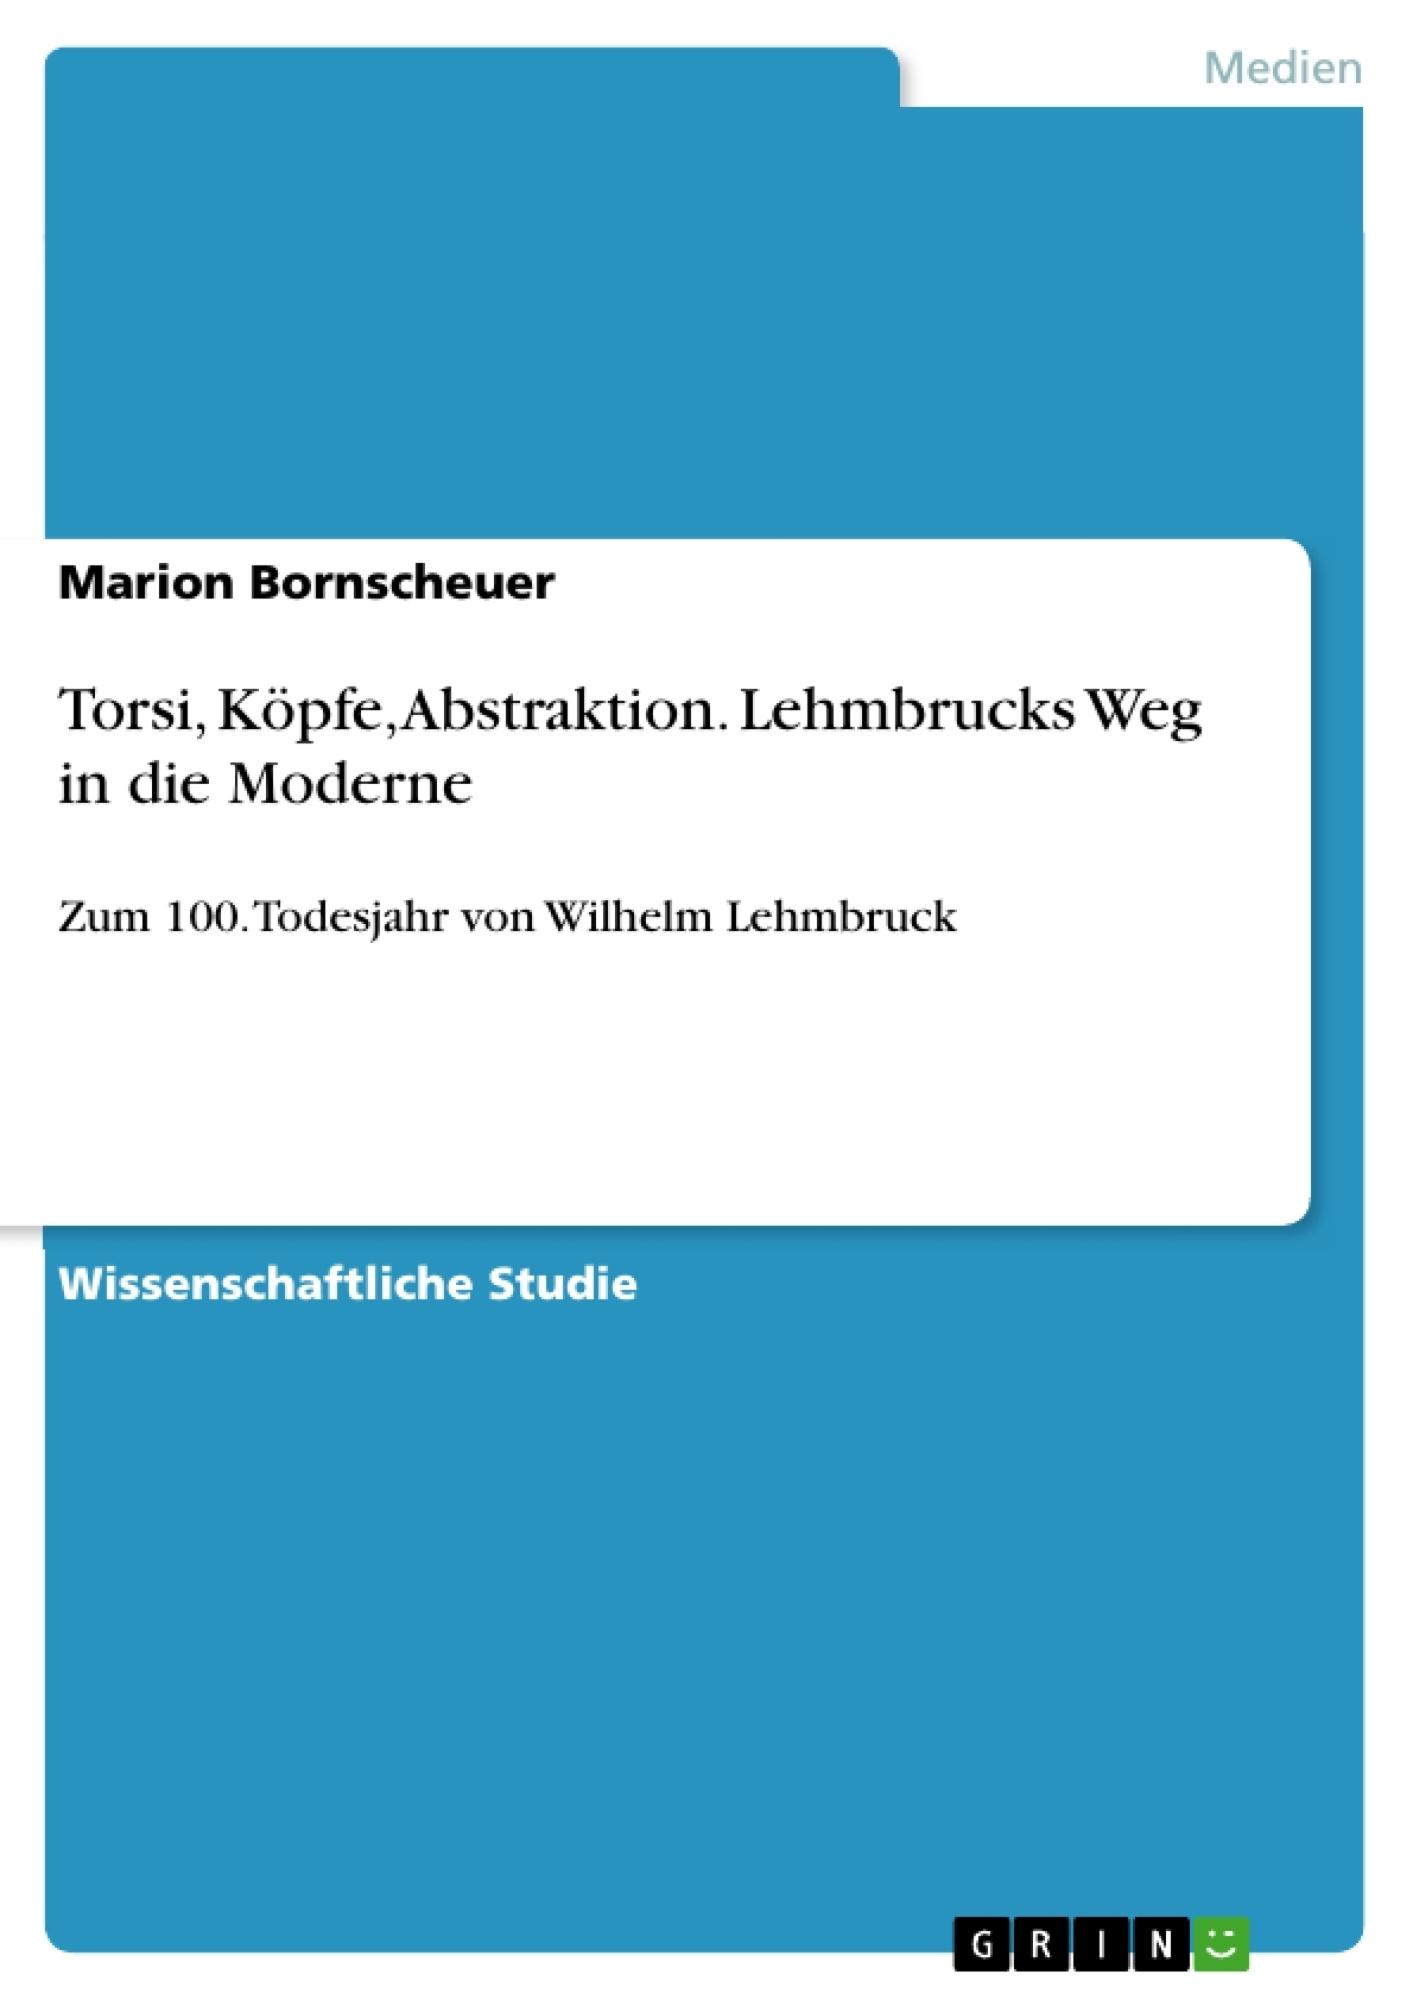 Titel: Torsi, Köpfe, Abstraktion. Lehmbrucks Weg in die Moderne